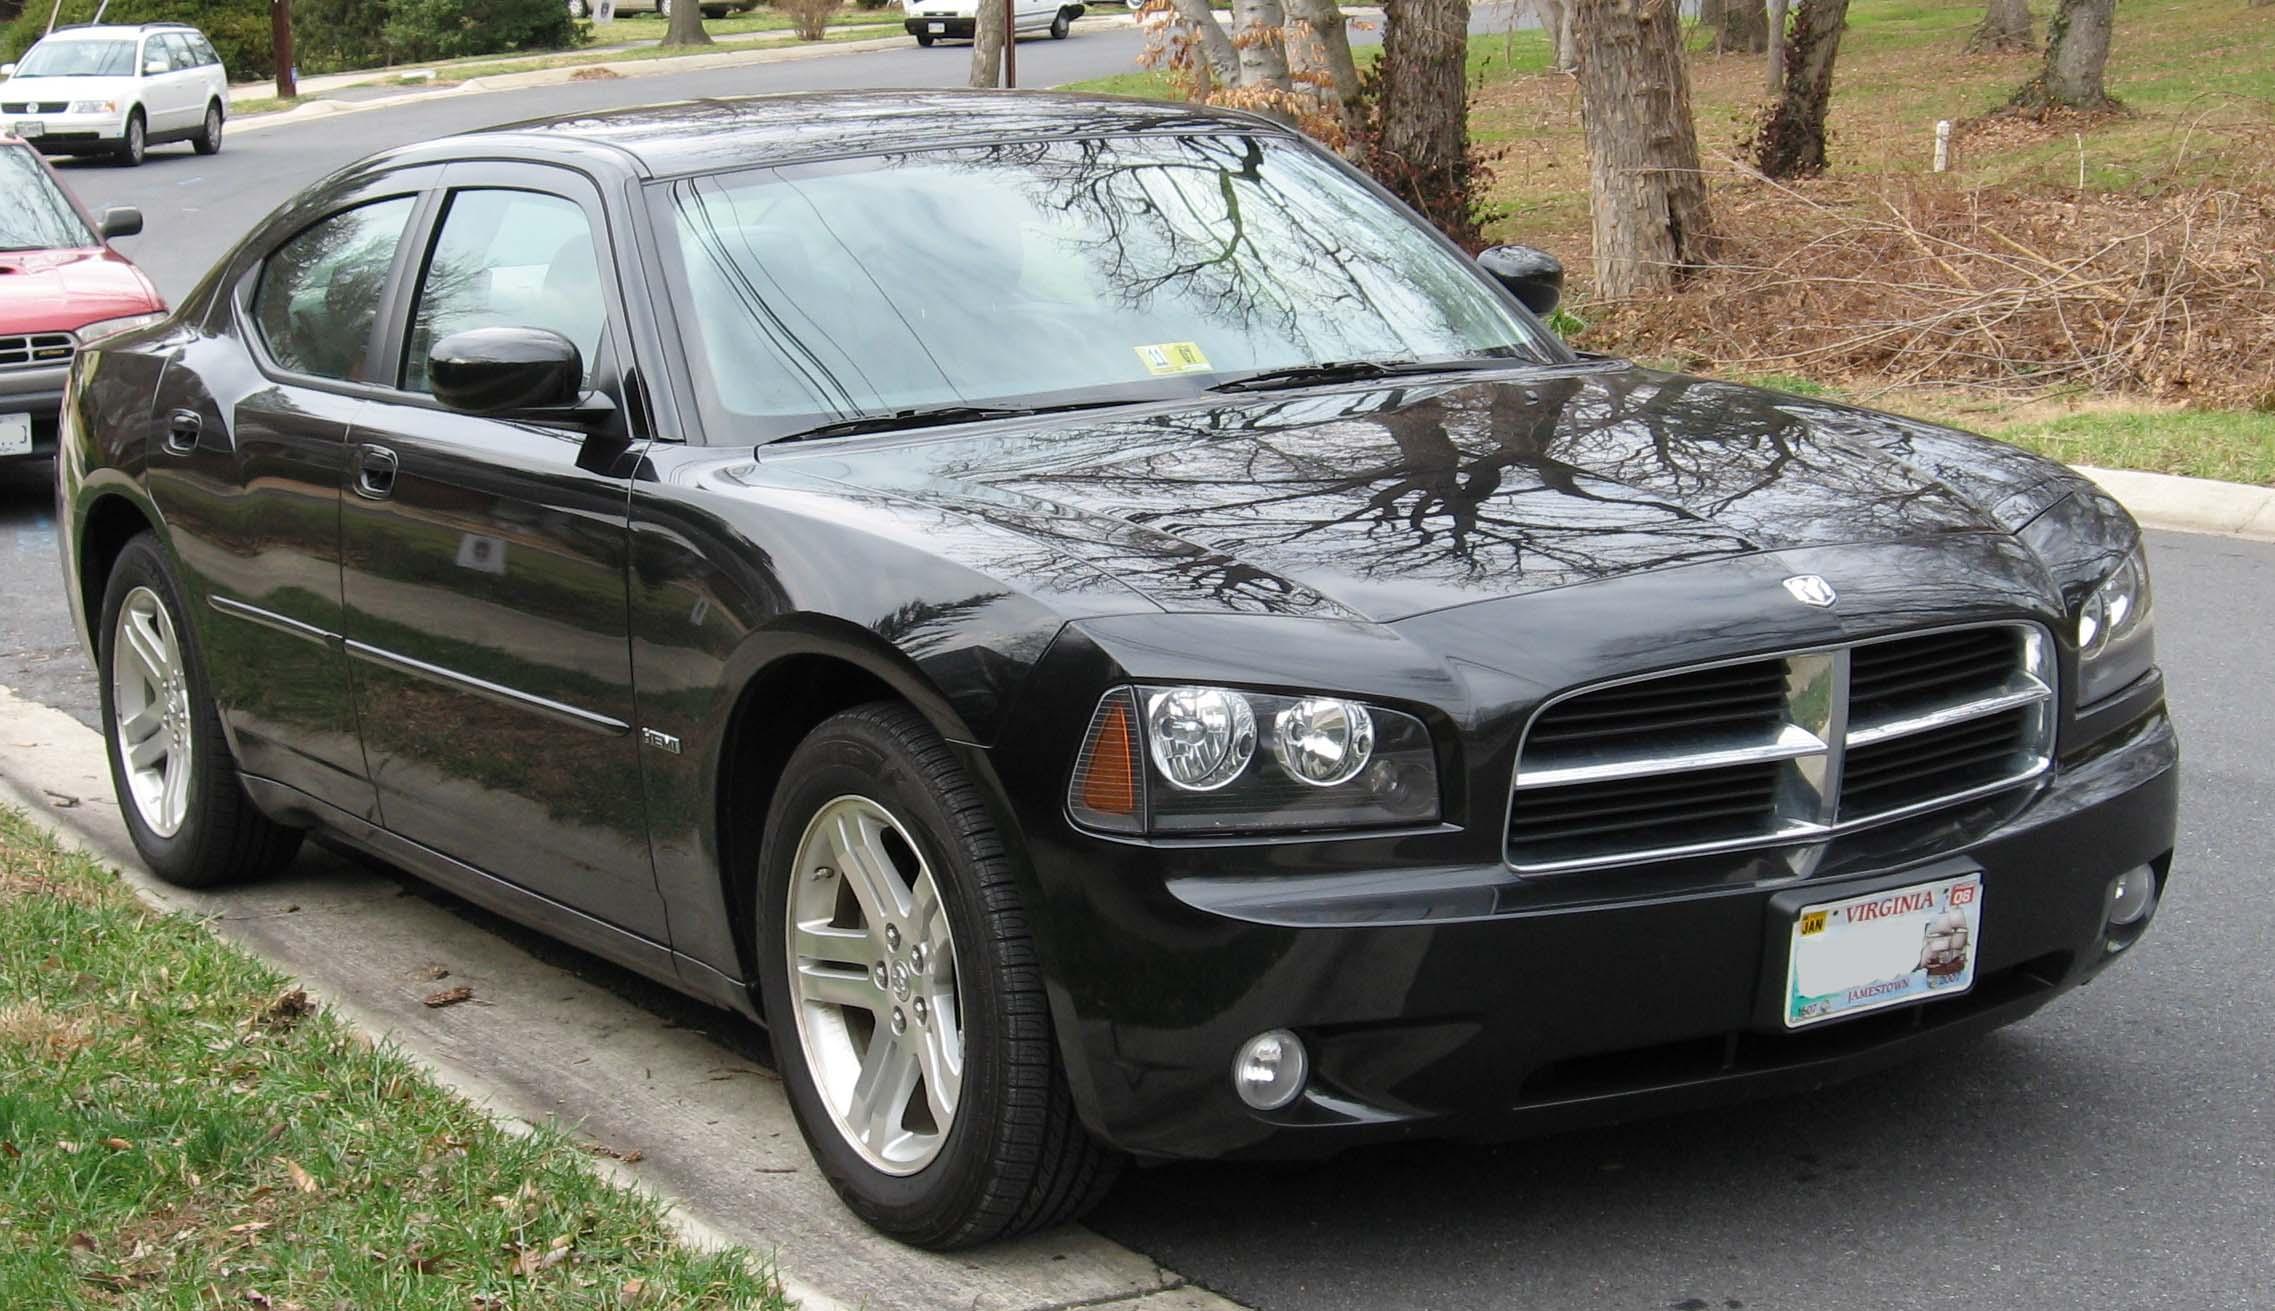 [Image: Dodge_Charger_sedan.jpg]